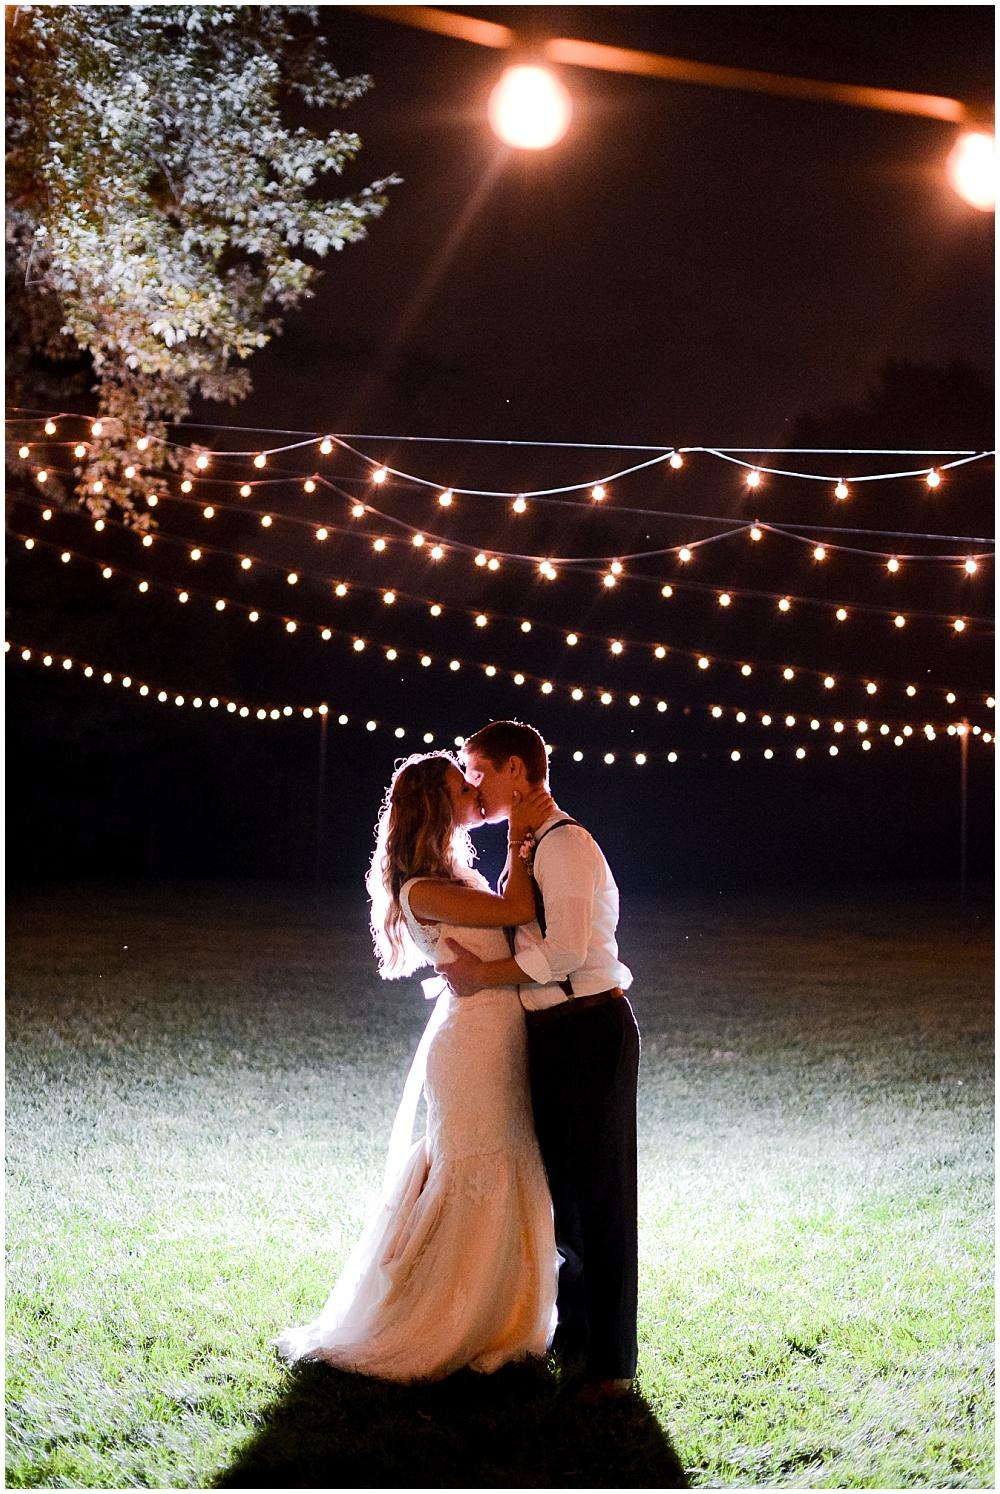 Bride and Groom under a canopy of lights | Mustard Seed Gardens Wedding by Sara Ackermann Photography & Jessica Dum Wedding Coordination